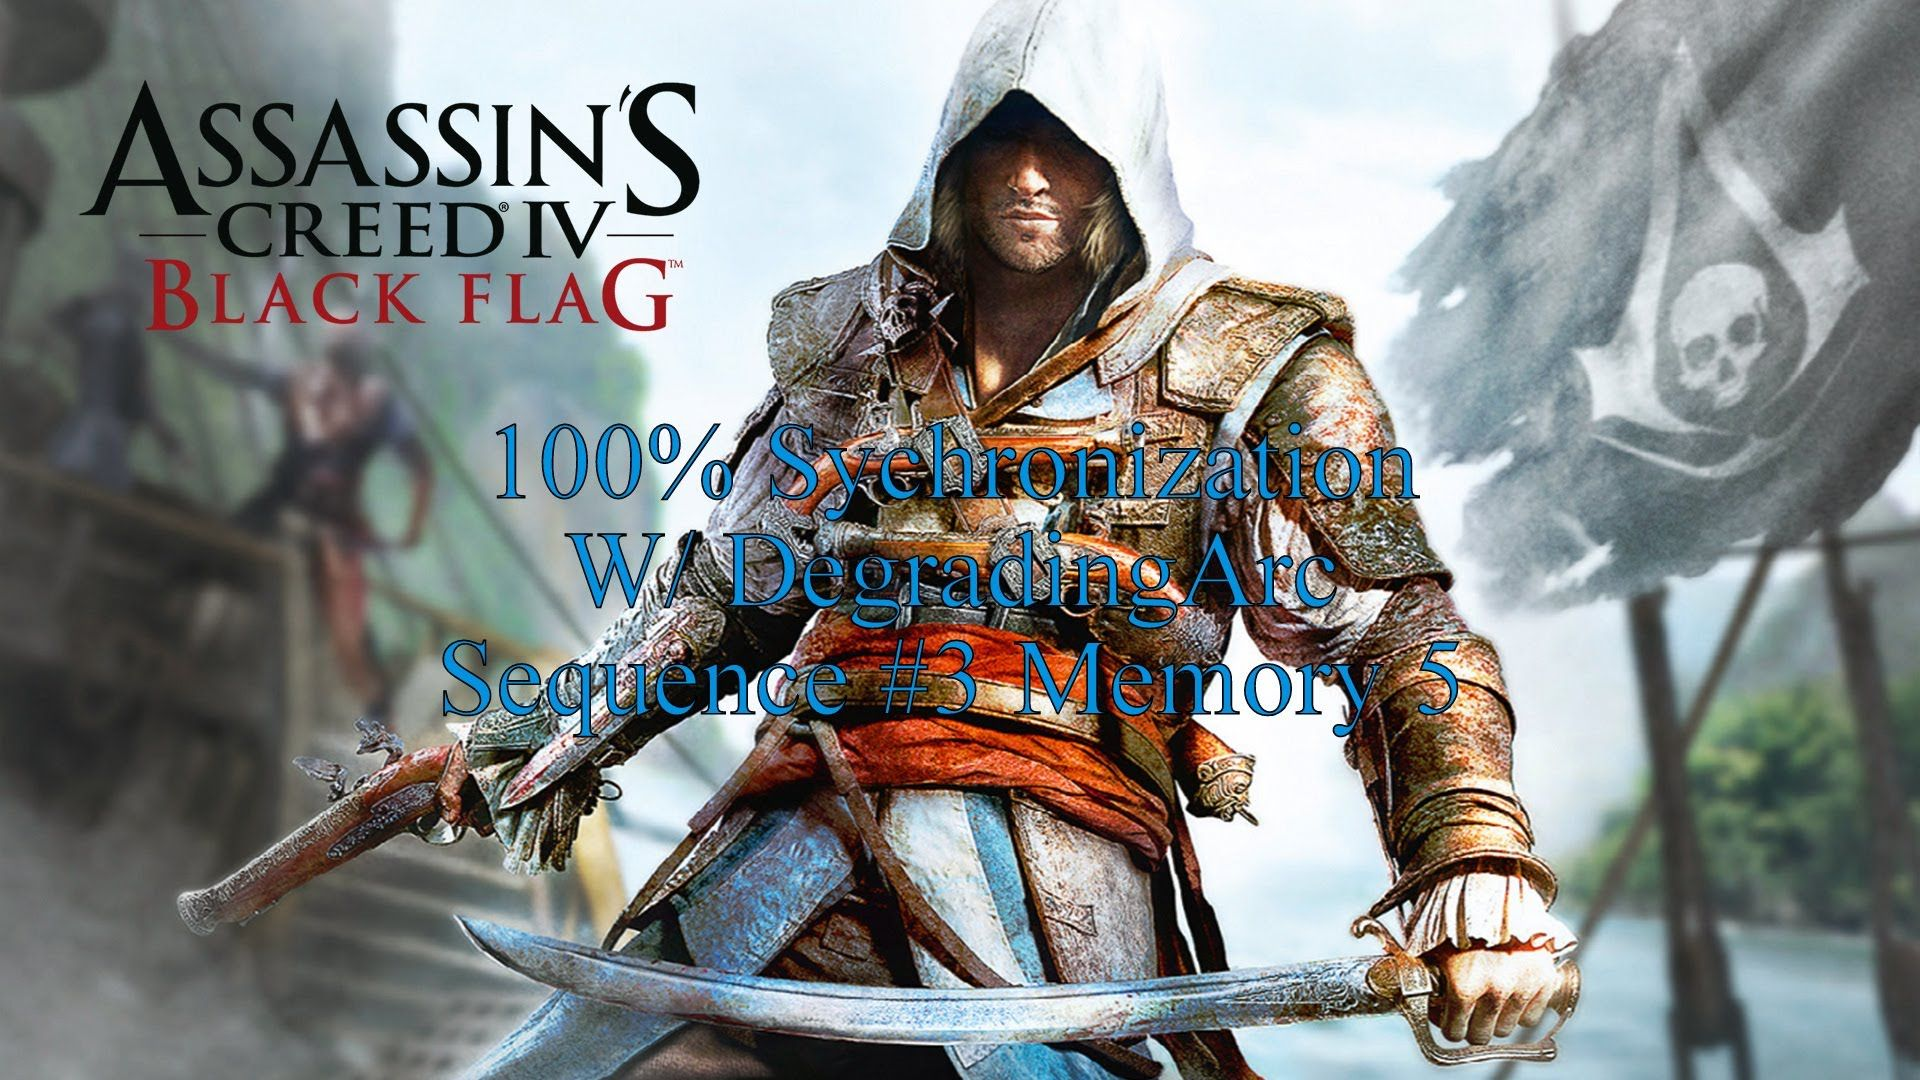 Assassin S Creed Iv Black Flag 100 Sync Walk Through Sequence 3 Memor Assassins Creed Black Flag Assassin S Creed Black Assassins Creed 4